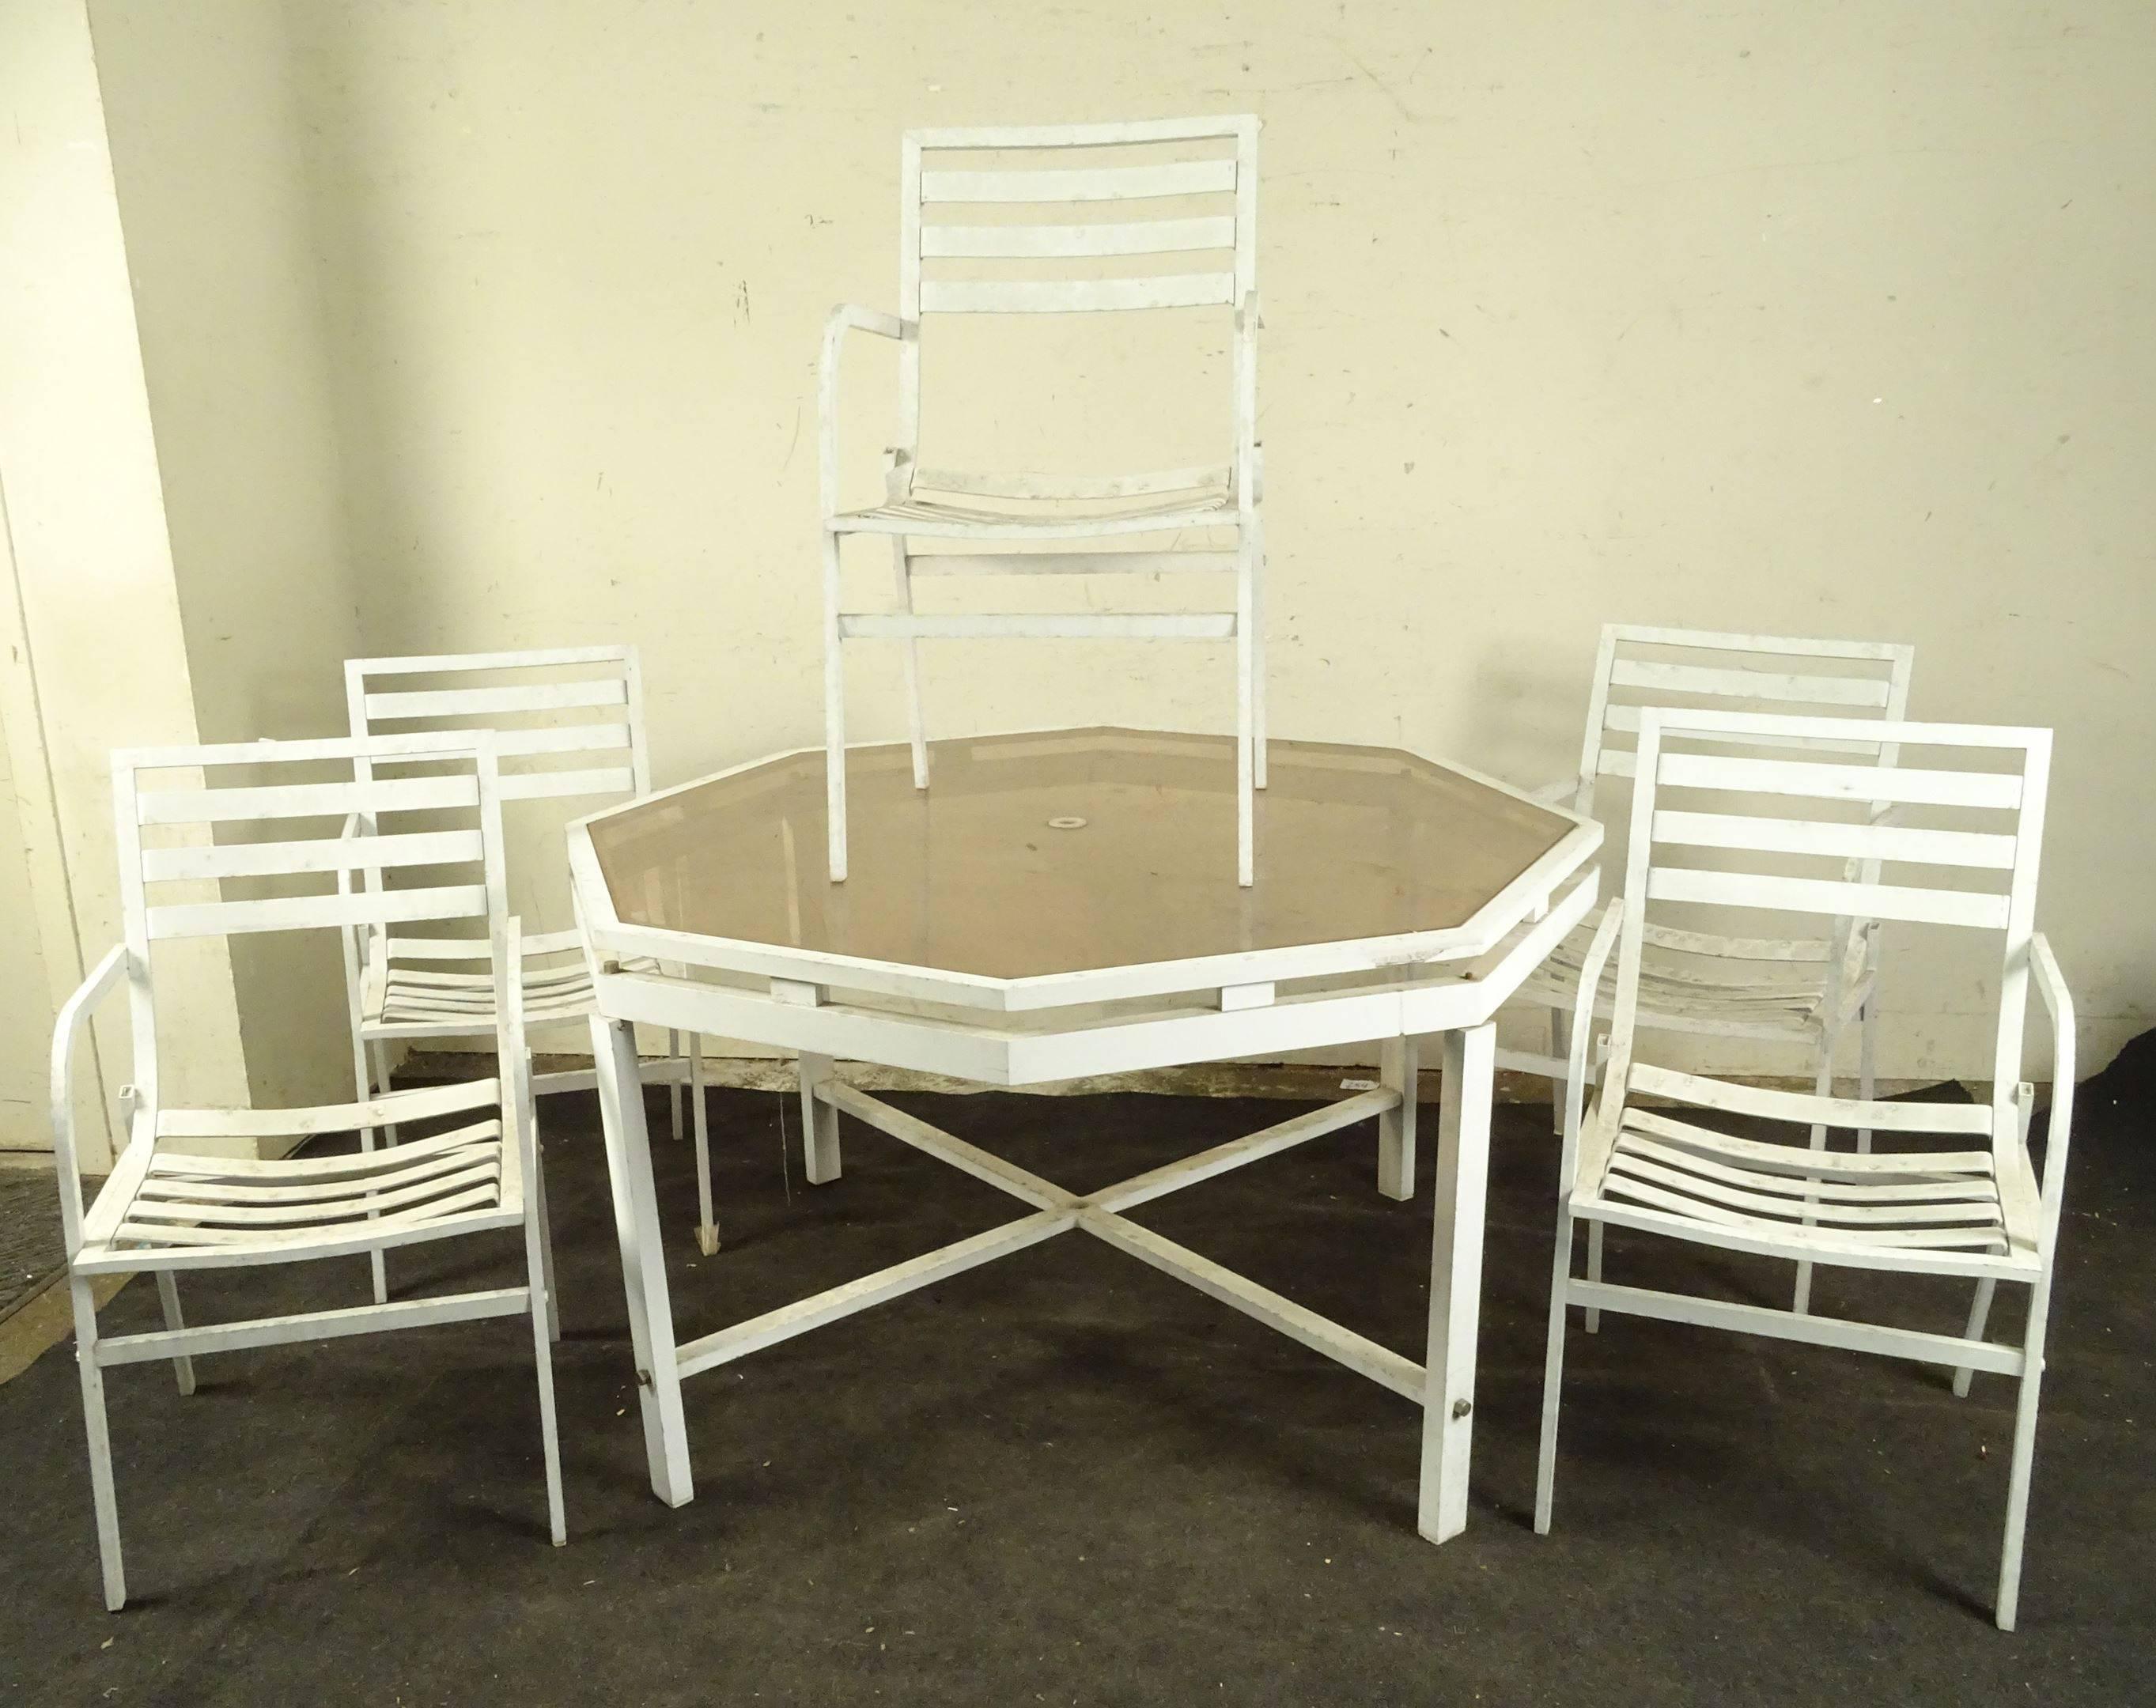 HUGONET - Mobilier de jardin en aluminium laqué blanc ...